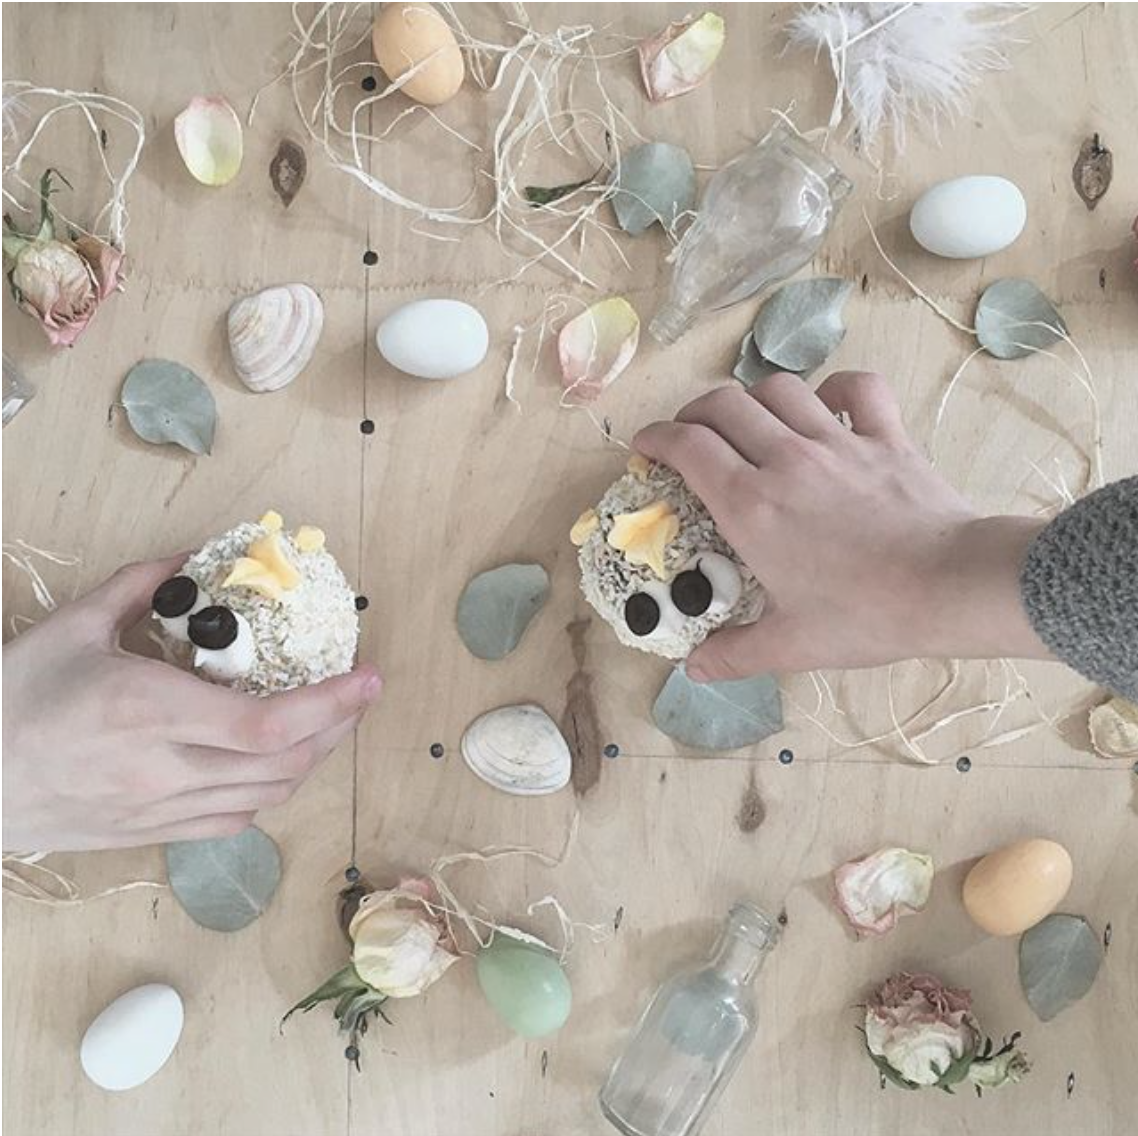 HYGGE - Instagram kids, instagram life, social media frenzy -Anya Jensen Photography